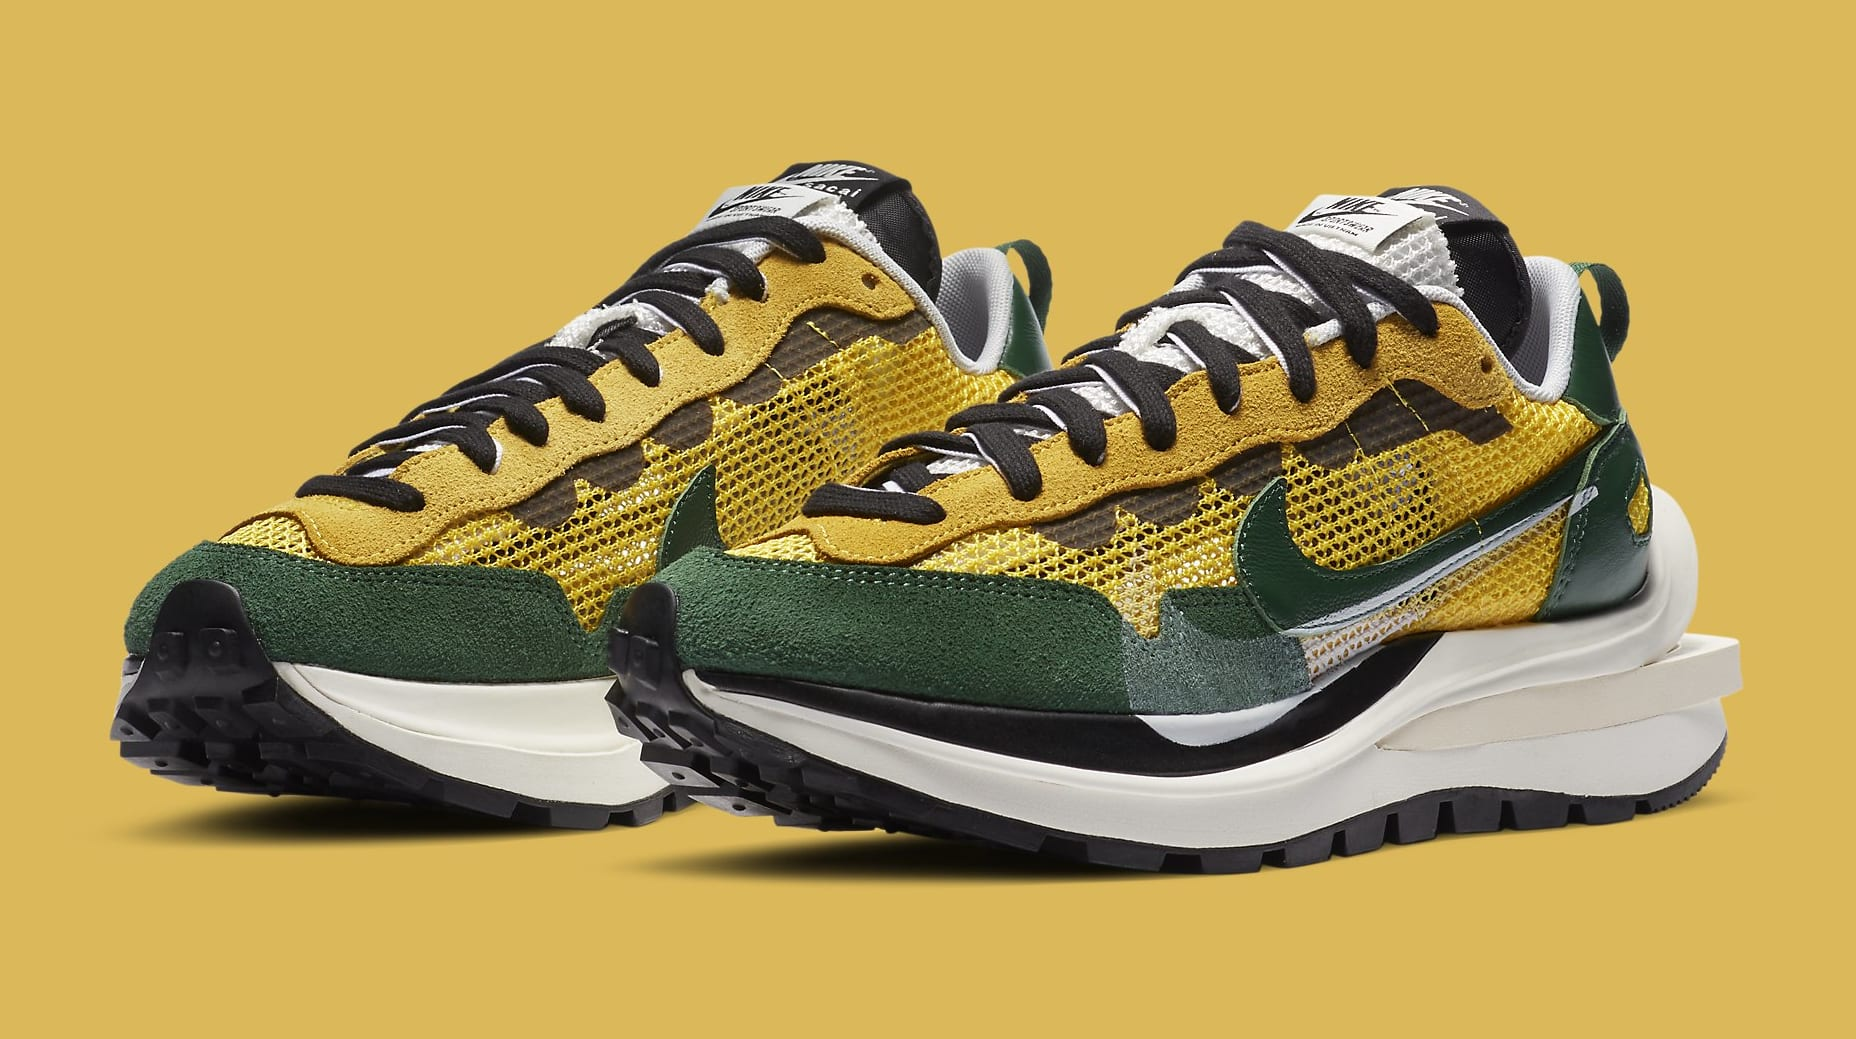 Sacai x Nike VaporWaffle 'Tour Yellow' CV1363-700 Pair